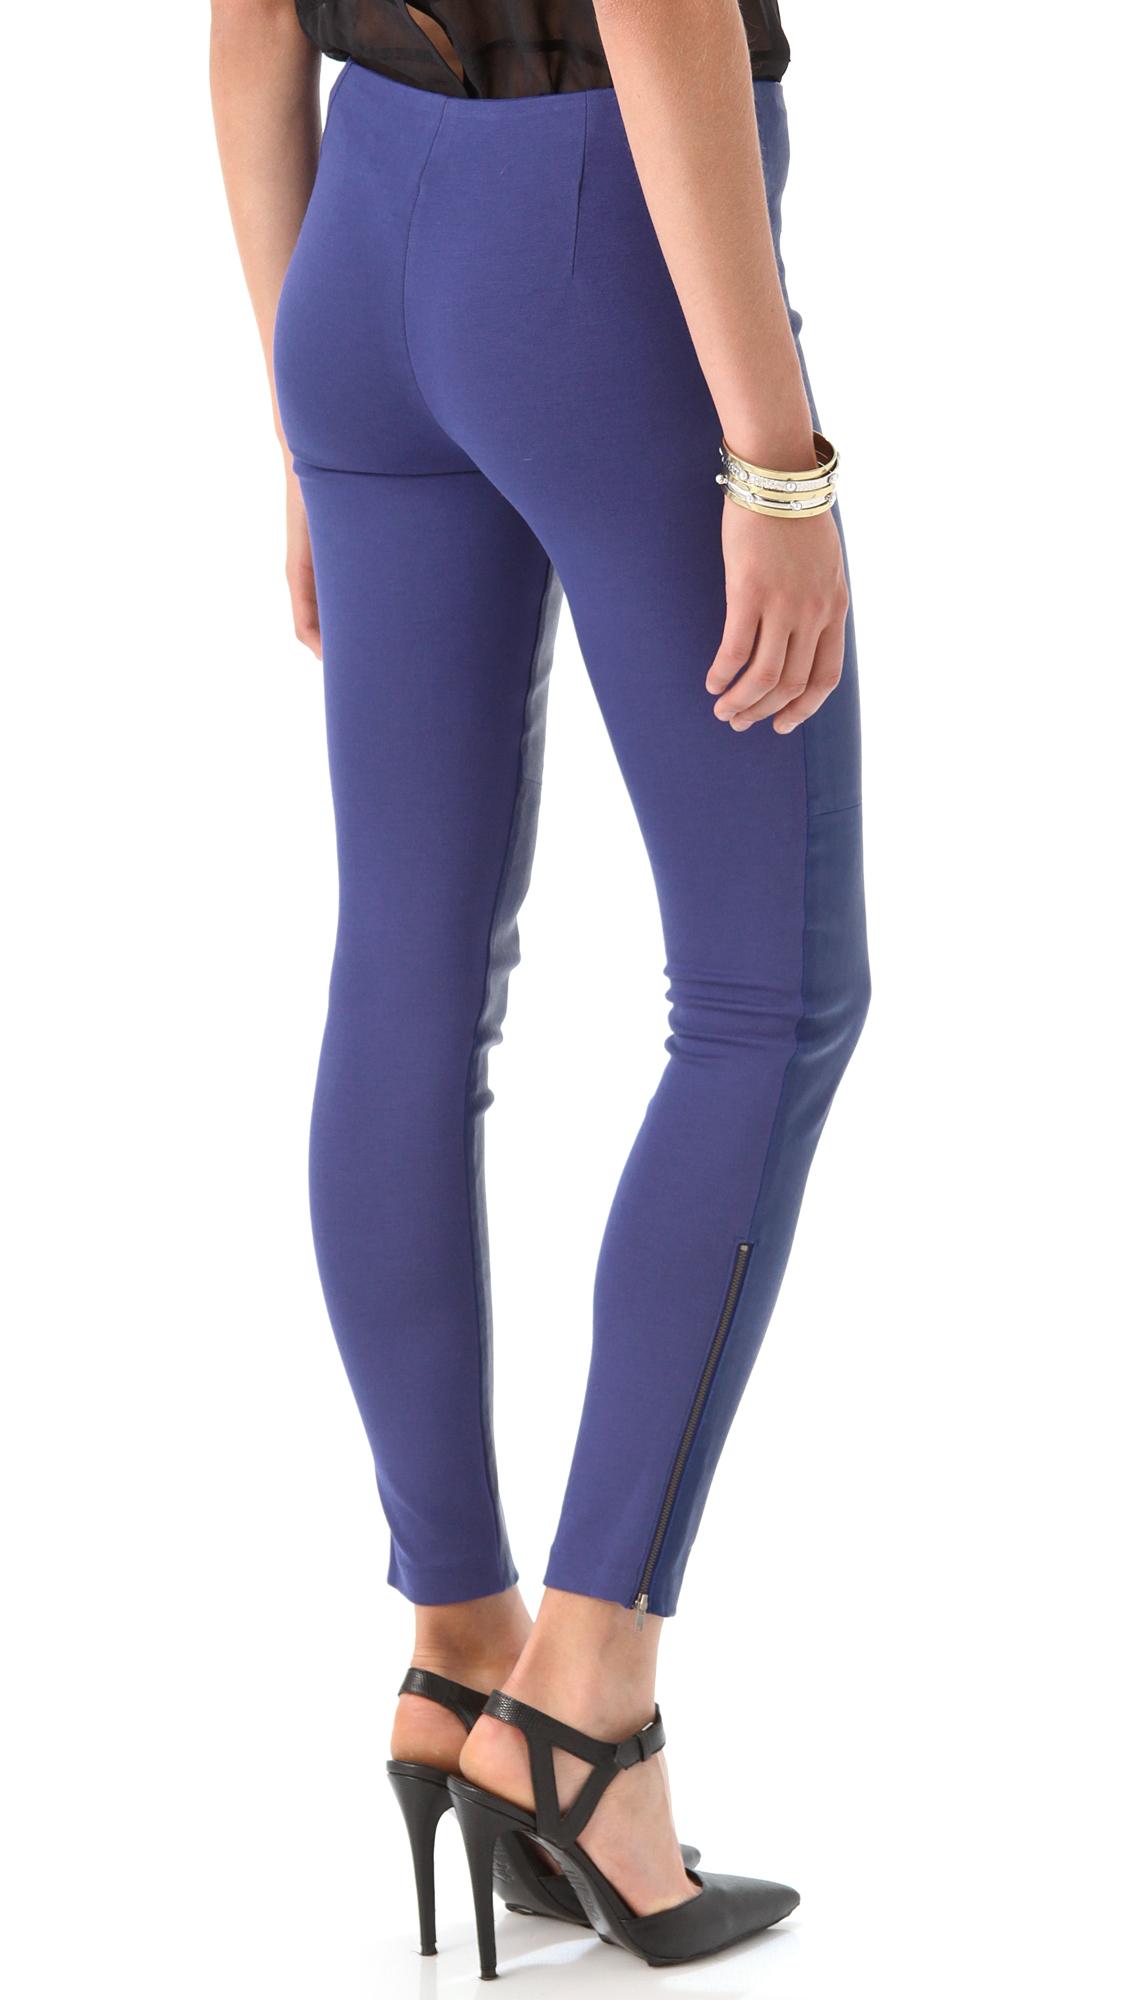 Catherine Malandrino Zip Up Leather Pants In Cobalt Blue